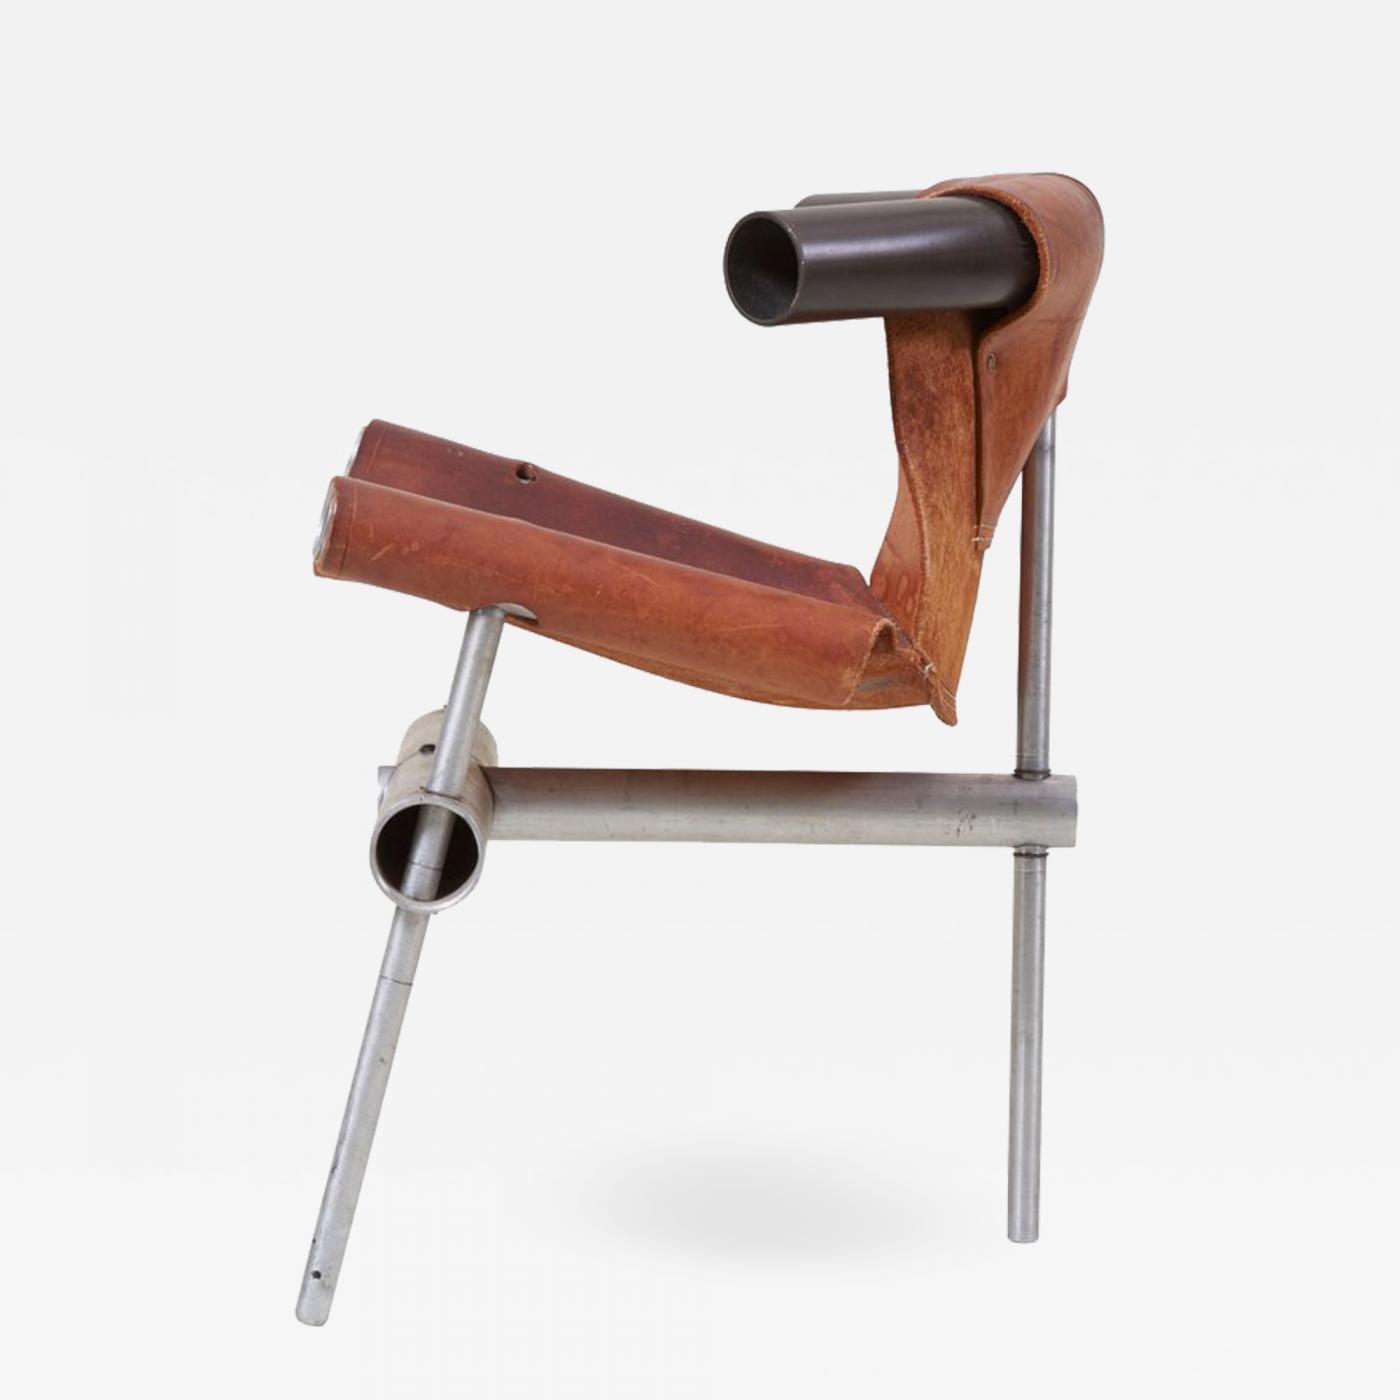 Beau Listings / Furniture / Seating / Lounge Chairs · Max Gottschalk Max  Gottschalk Prototype Leather Sling ...